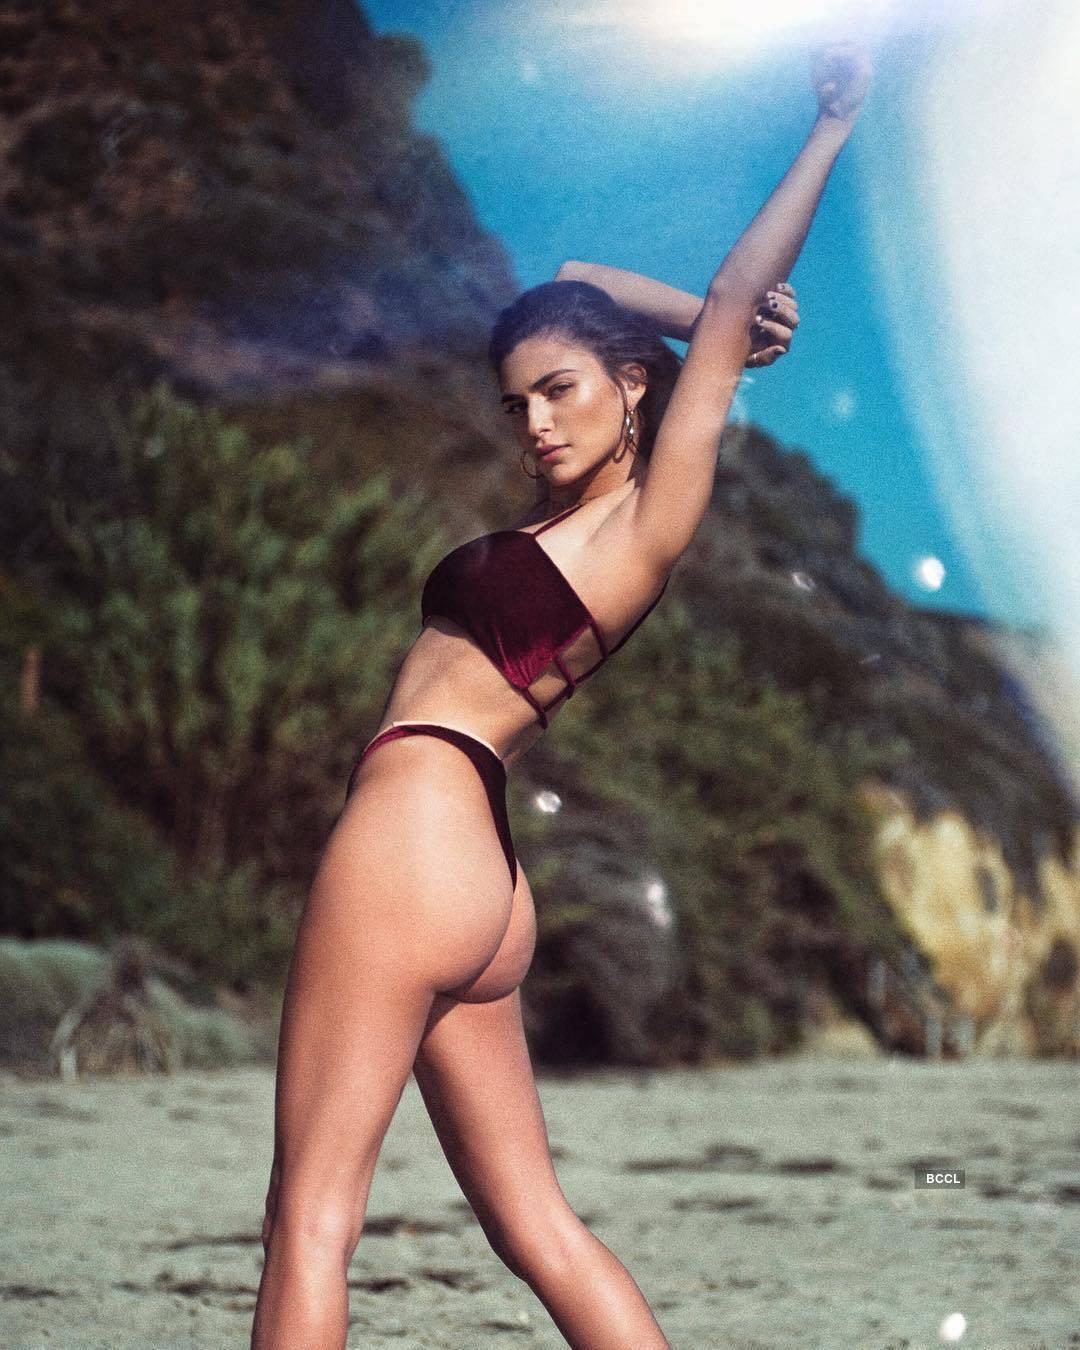 Playboy Models on Instagram